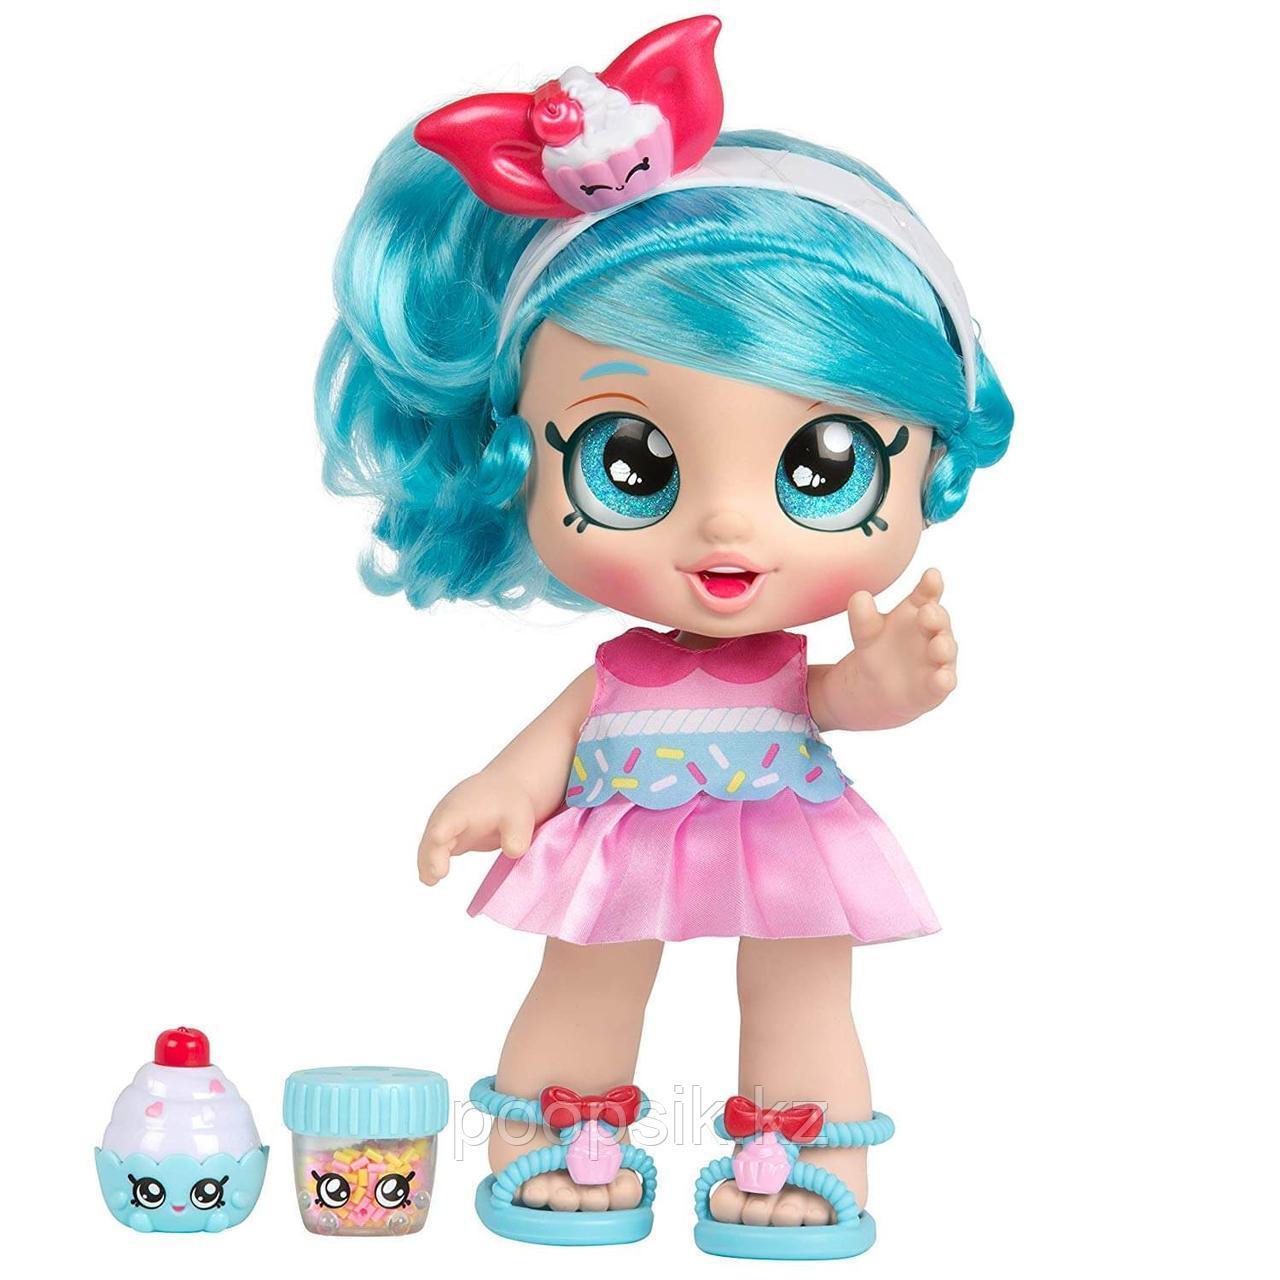 Кукла Кинди Кидс Джейсикейк (Пироженка) 25см - фото 1